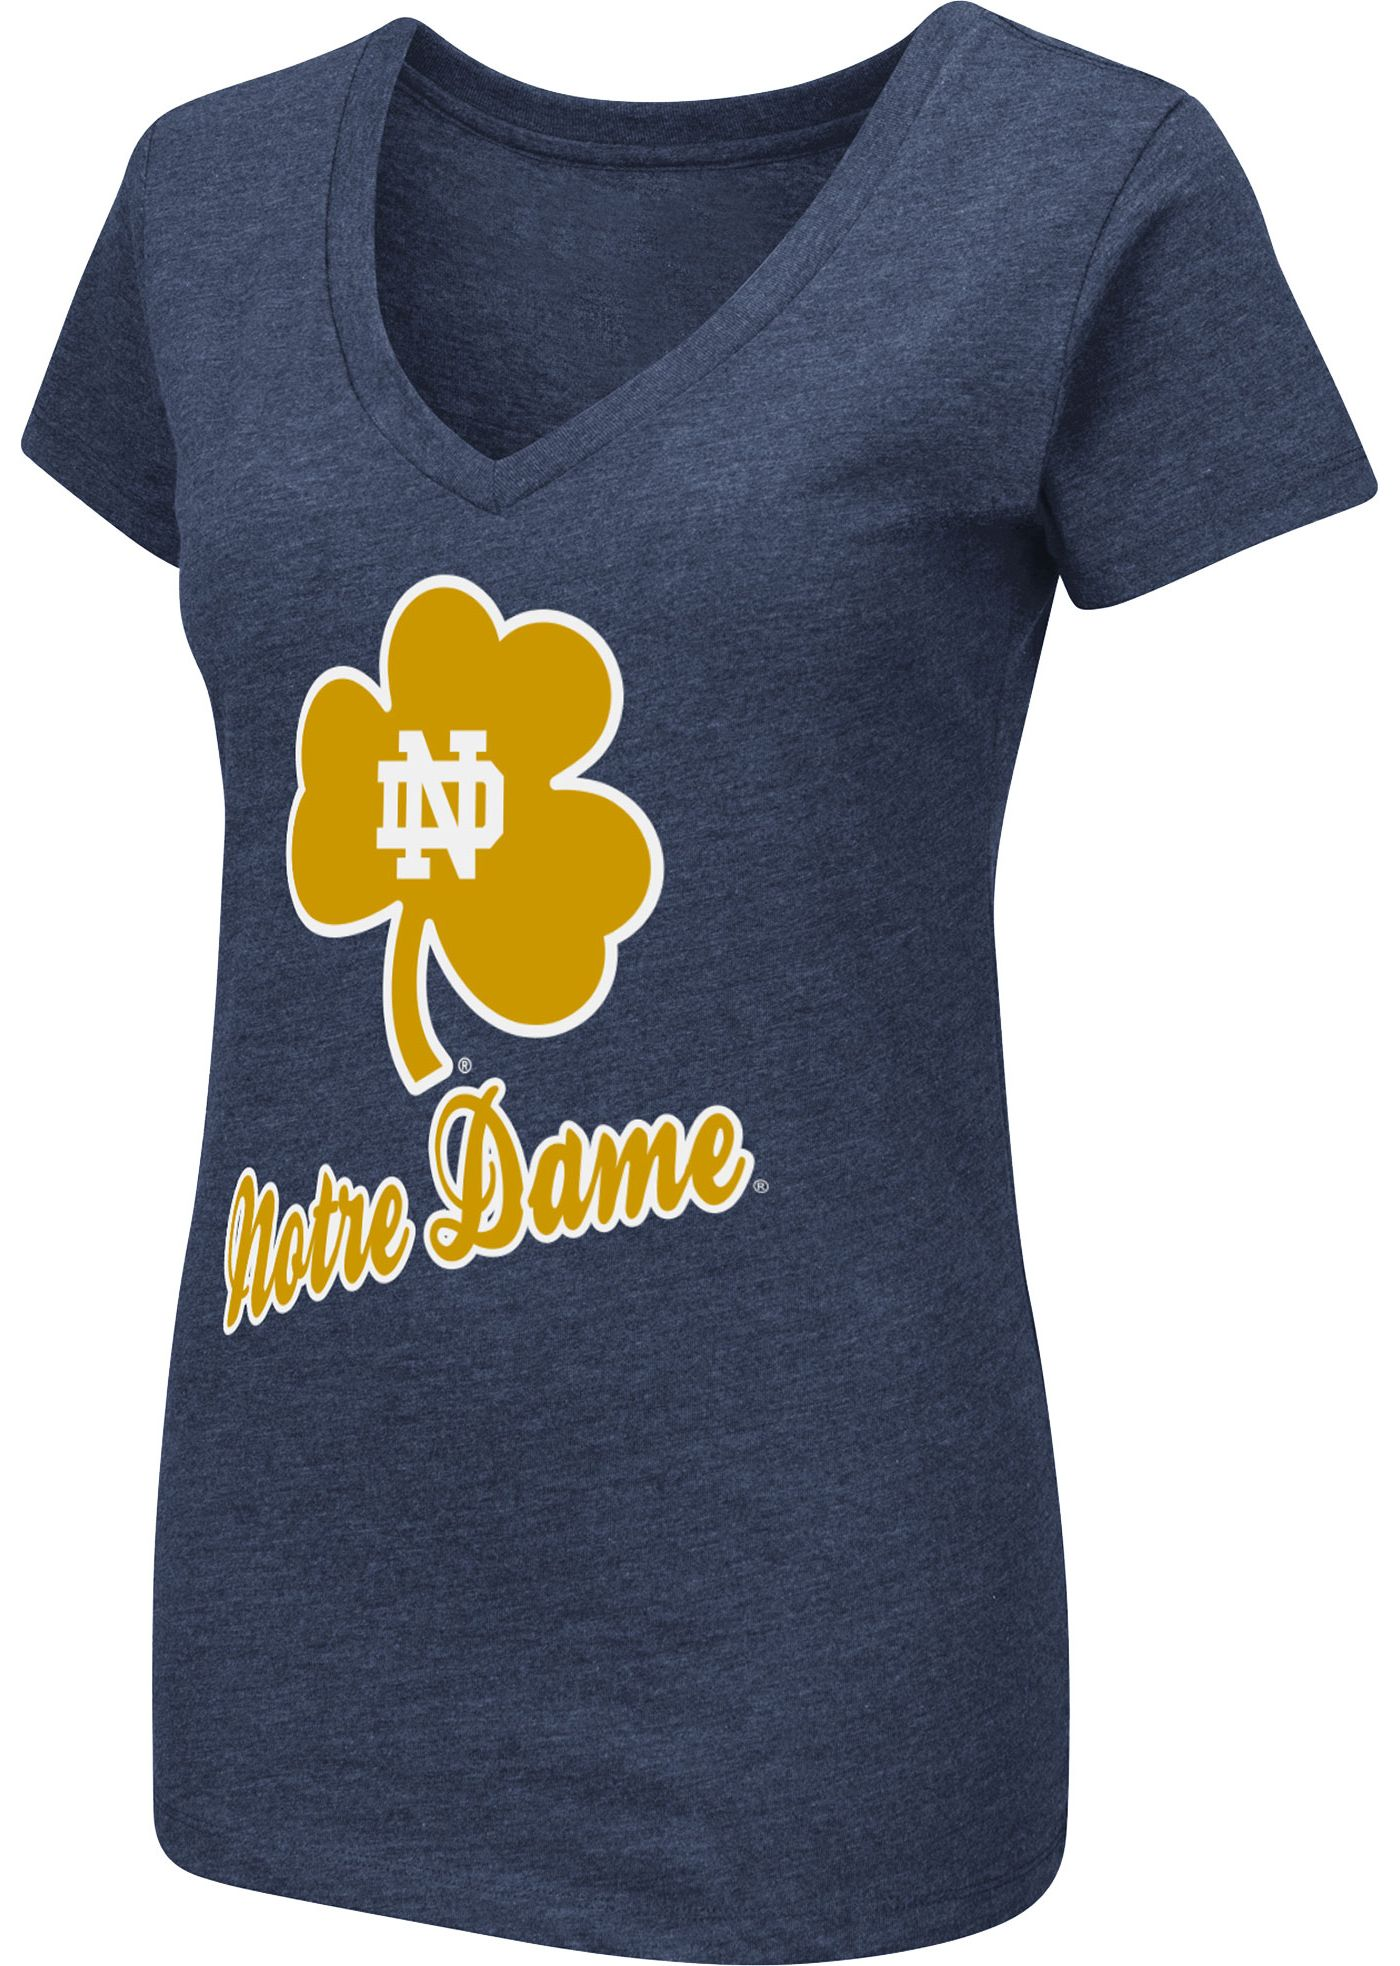 Colosseum Women's Notre Dame Fighting Irish Navy Dual Blend V-Neck T-Shirt